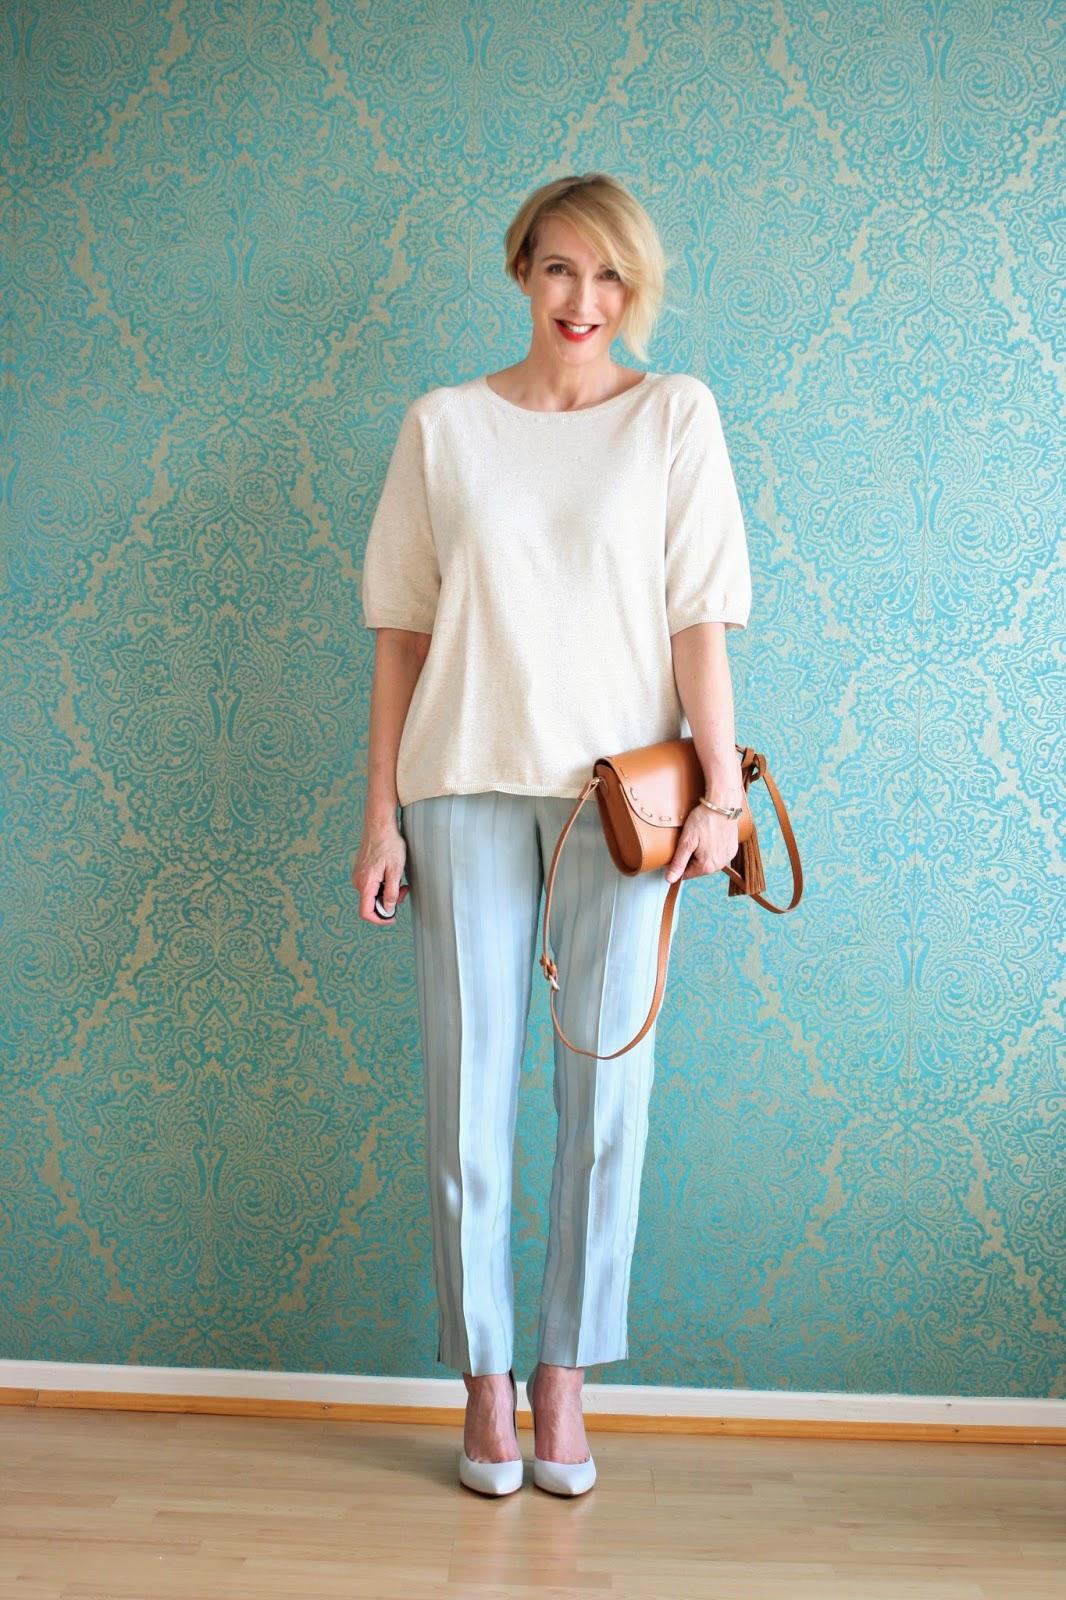 Frühlings-Outfit mit hellblauer Hose